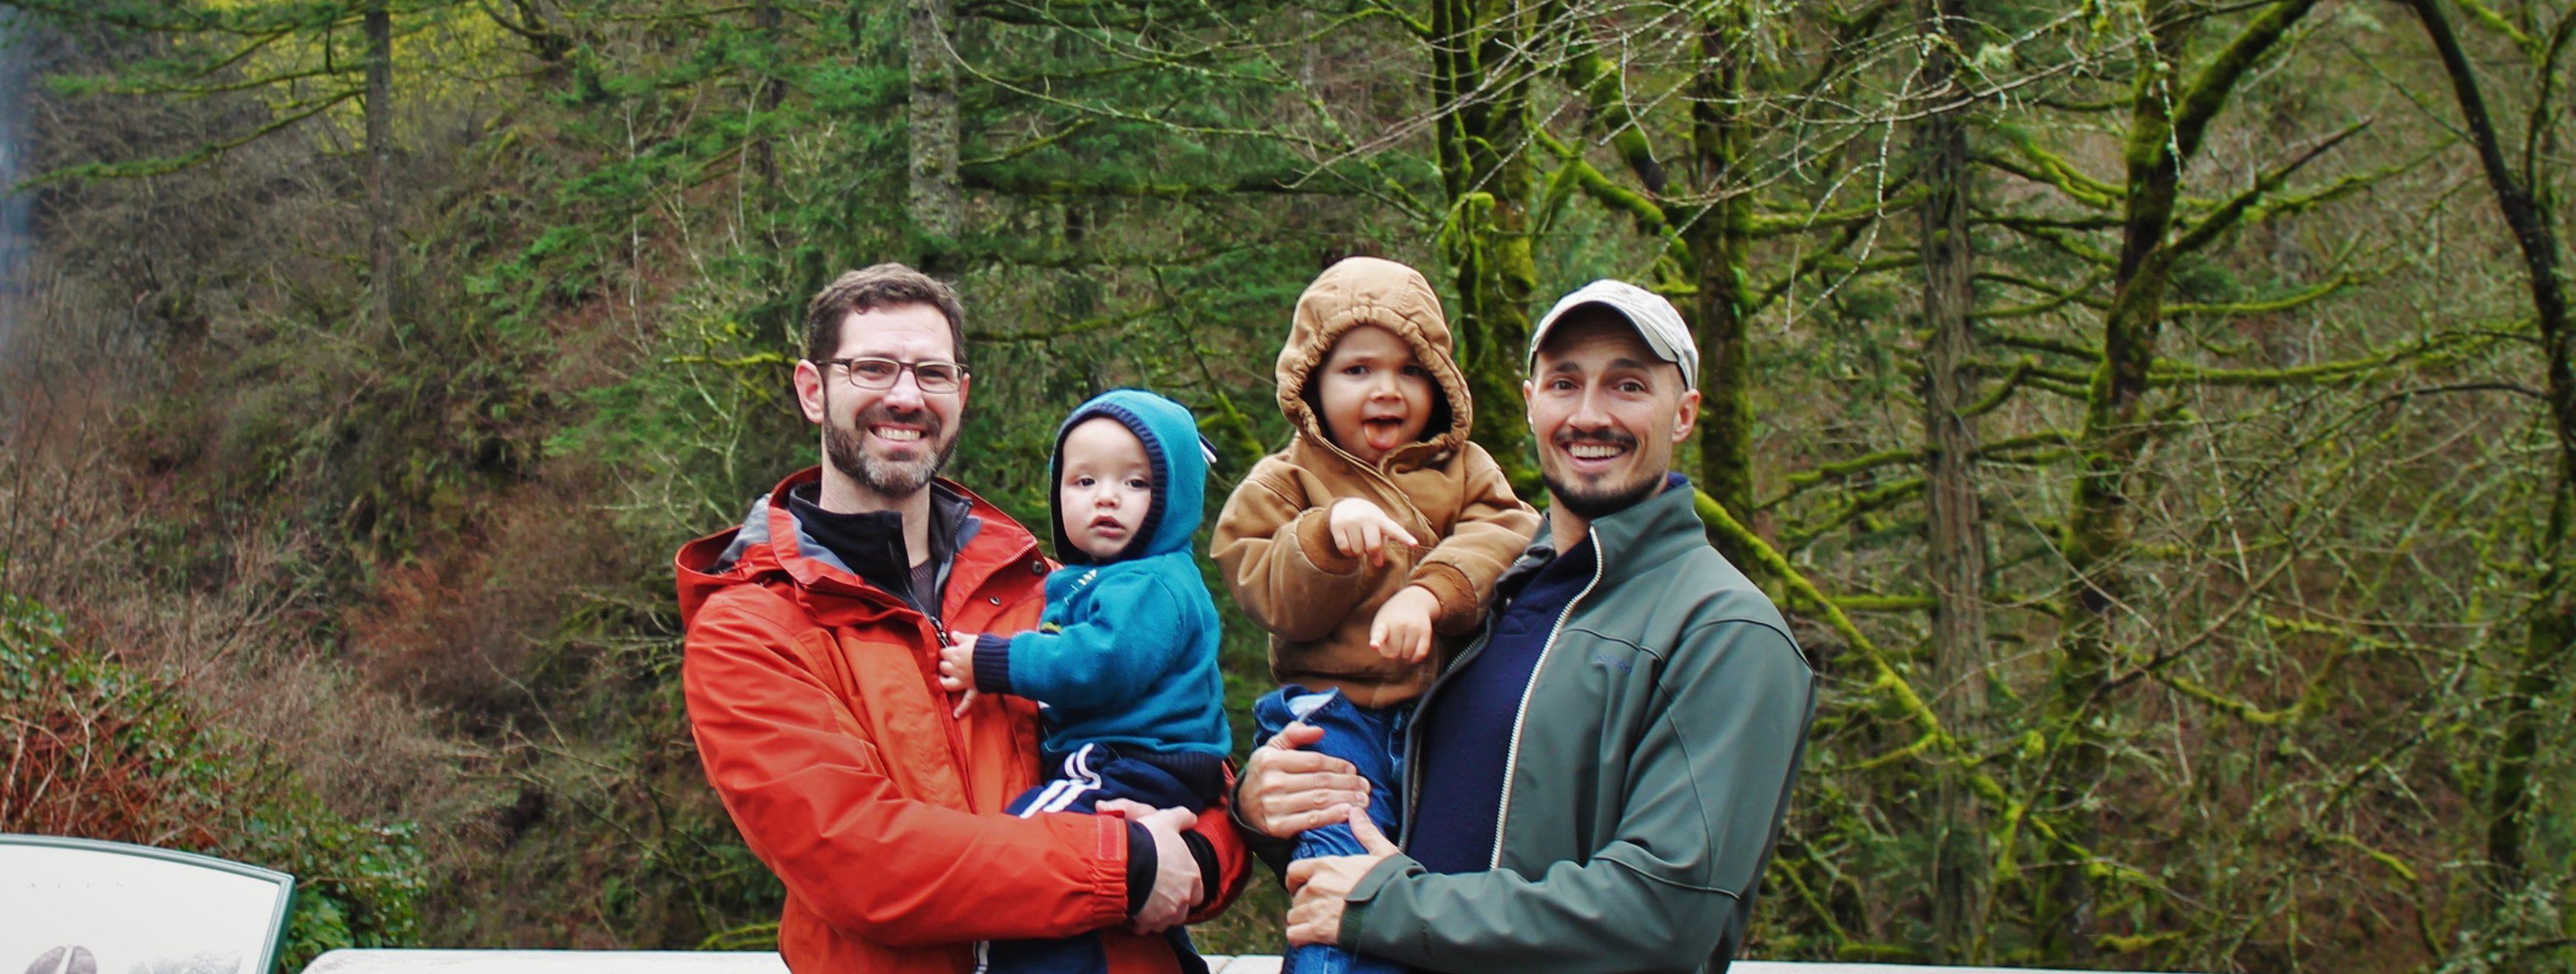 Taylor Family at Latourell Falls Waterfall Area Oregon 1